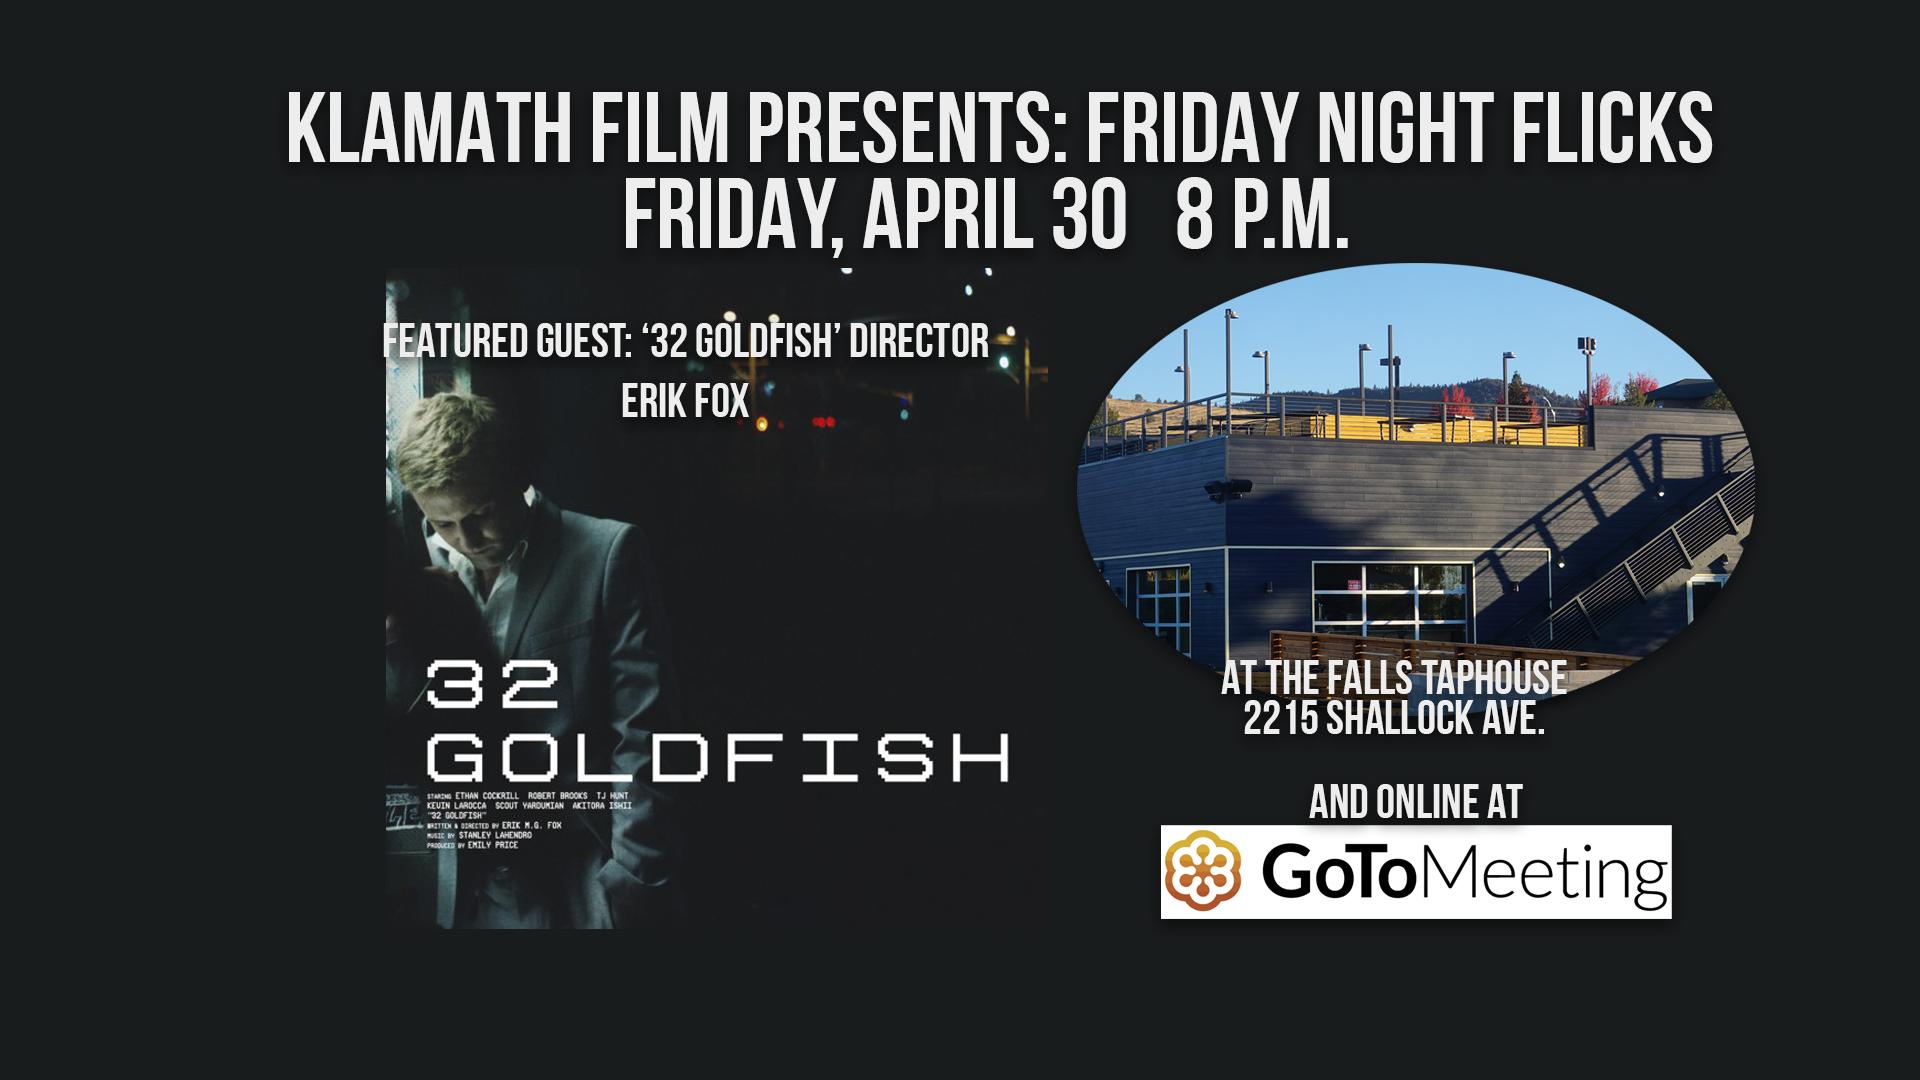 '32 Goldfish' film screening and Q&A at Falls Taphouse April 30